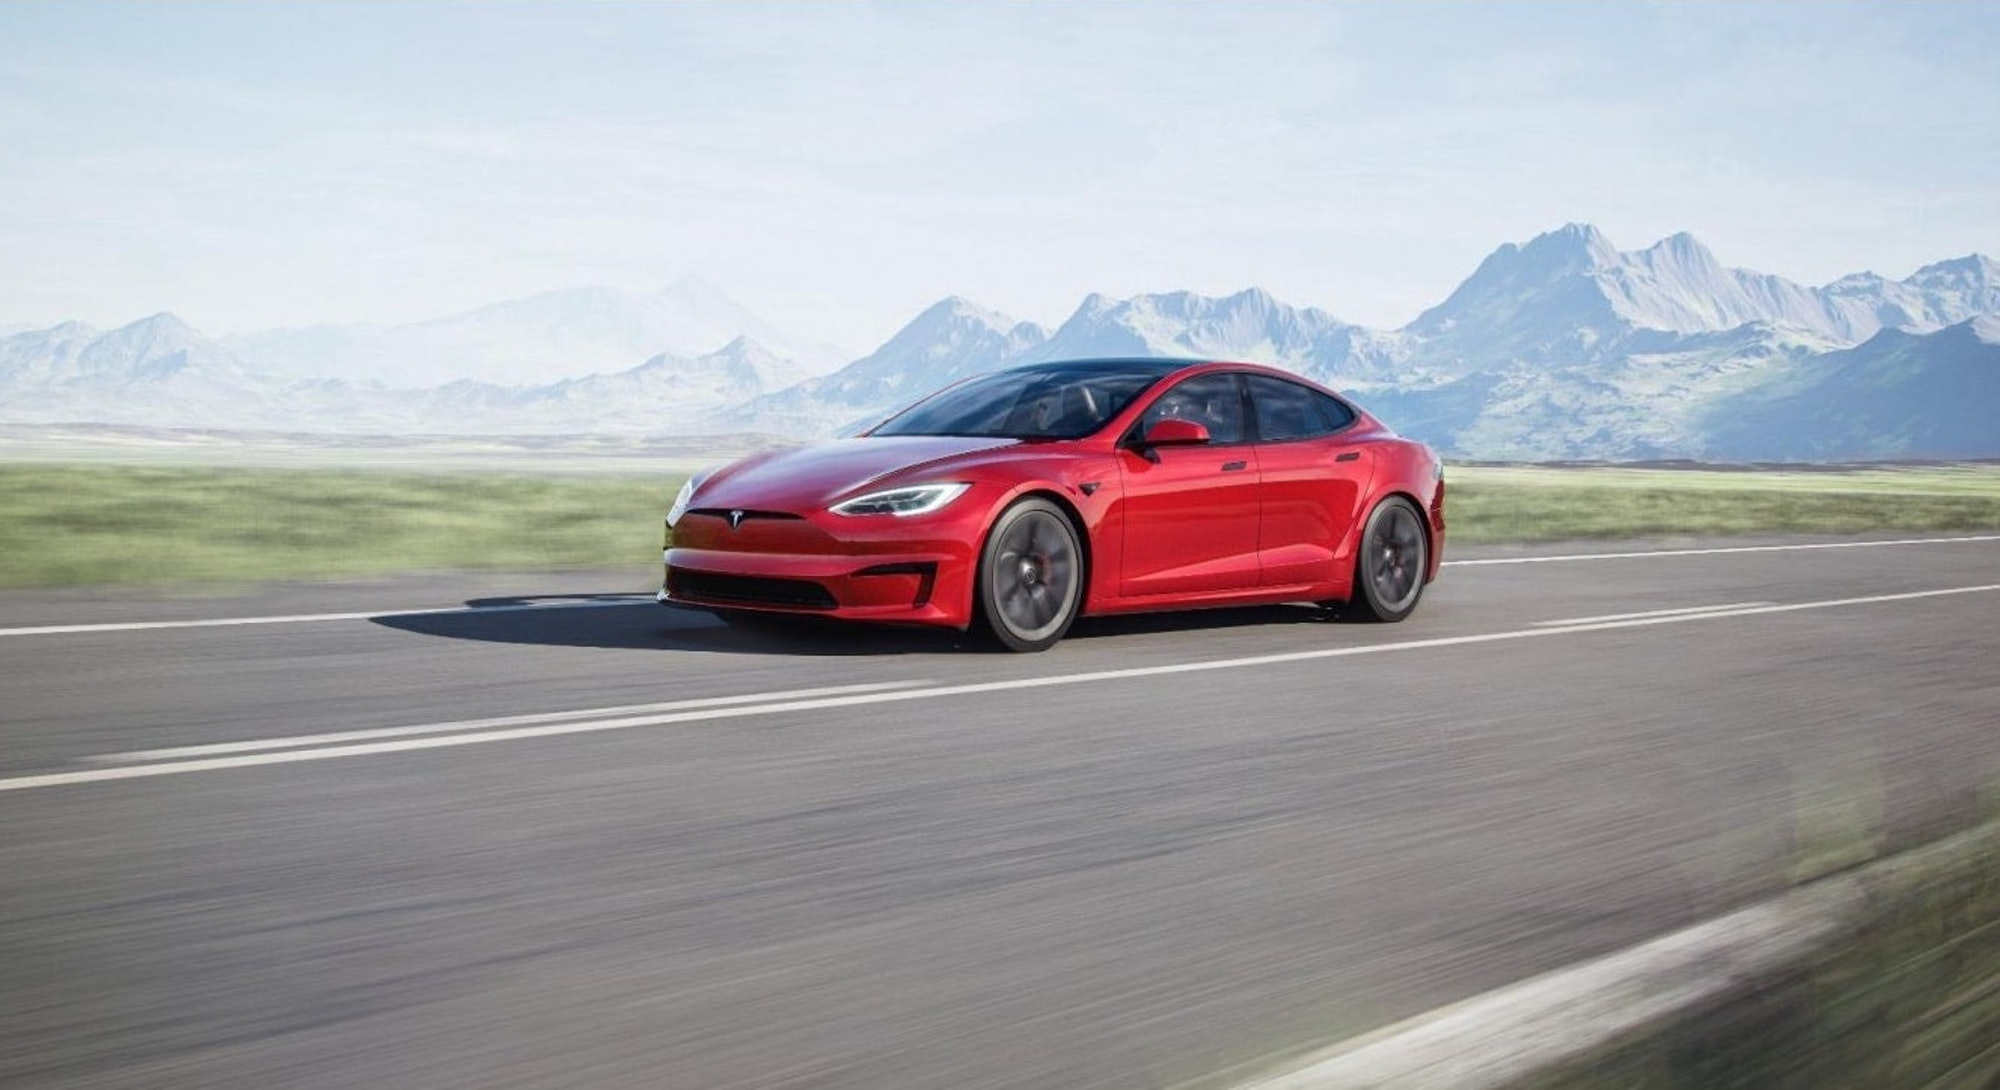 A Tesla Model S. EV. Electric vehicles. EVs. Electric cars.